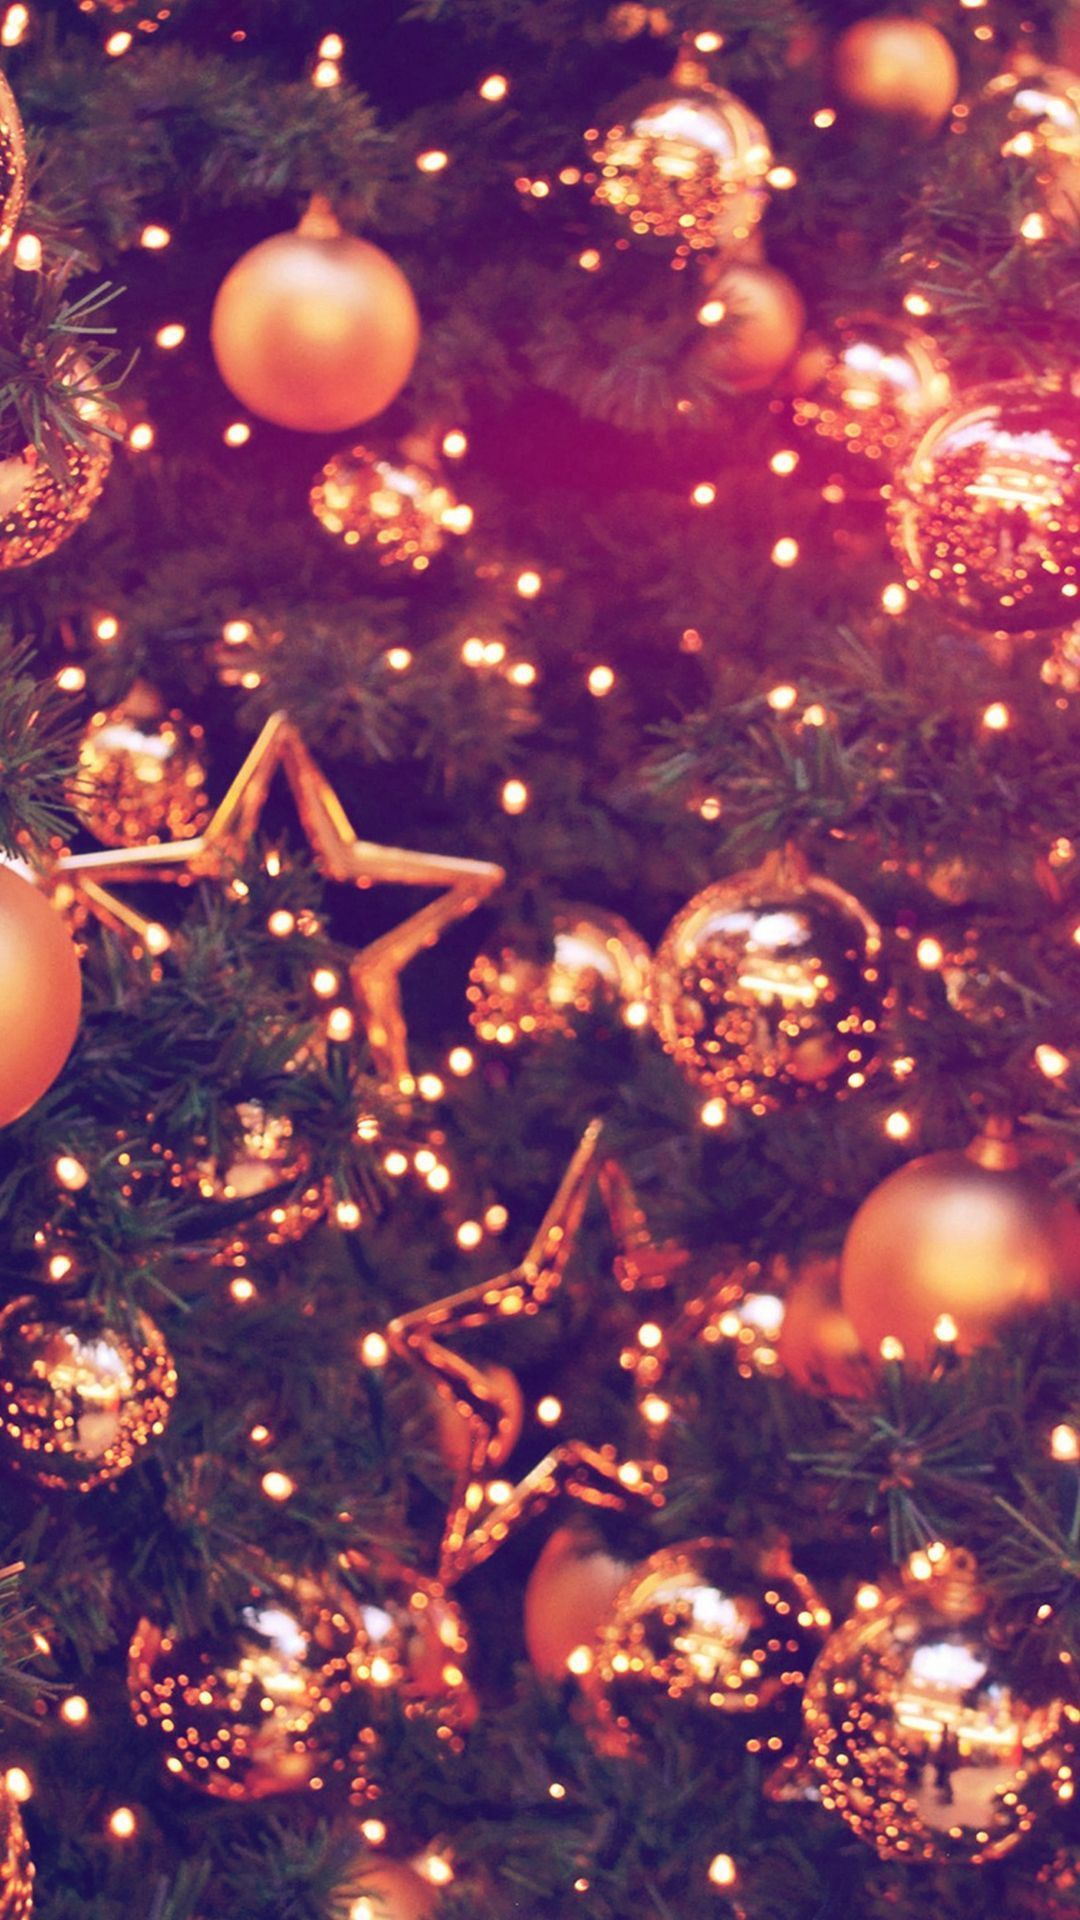 1080x1920 Christmas Wallpaper Iphone 6 Tumblr Drive Cheapusedmotorhome Info Wallpaper Iphone Christmas Xmas Wallpaper Christmas Tree Wallpaper Iphone